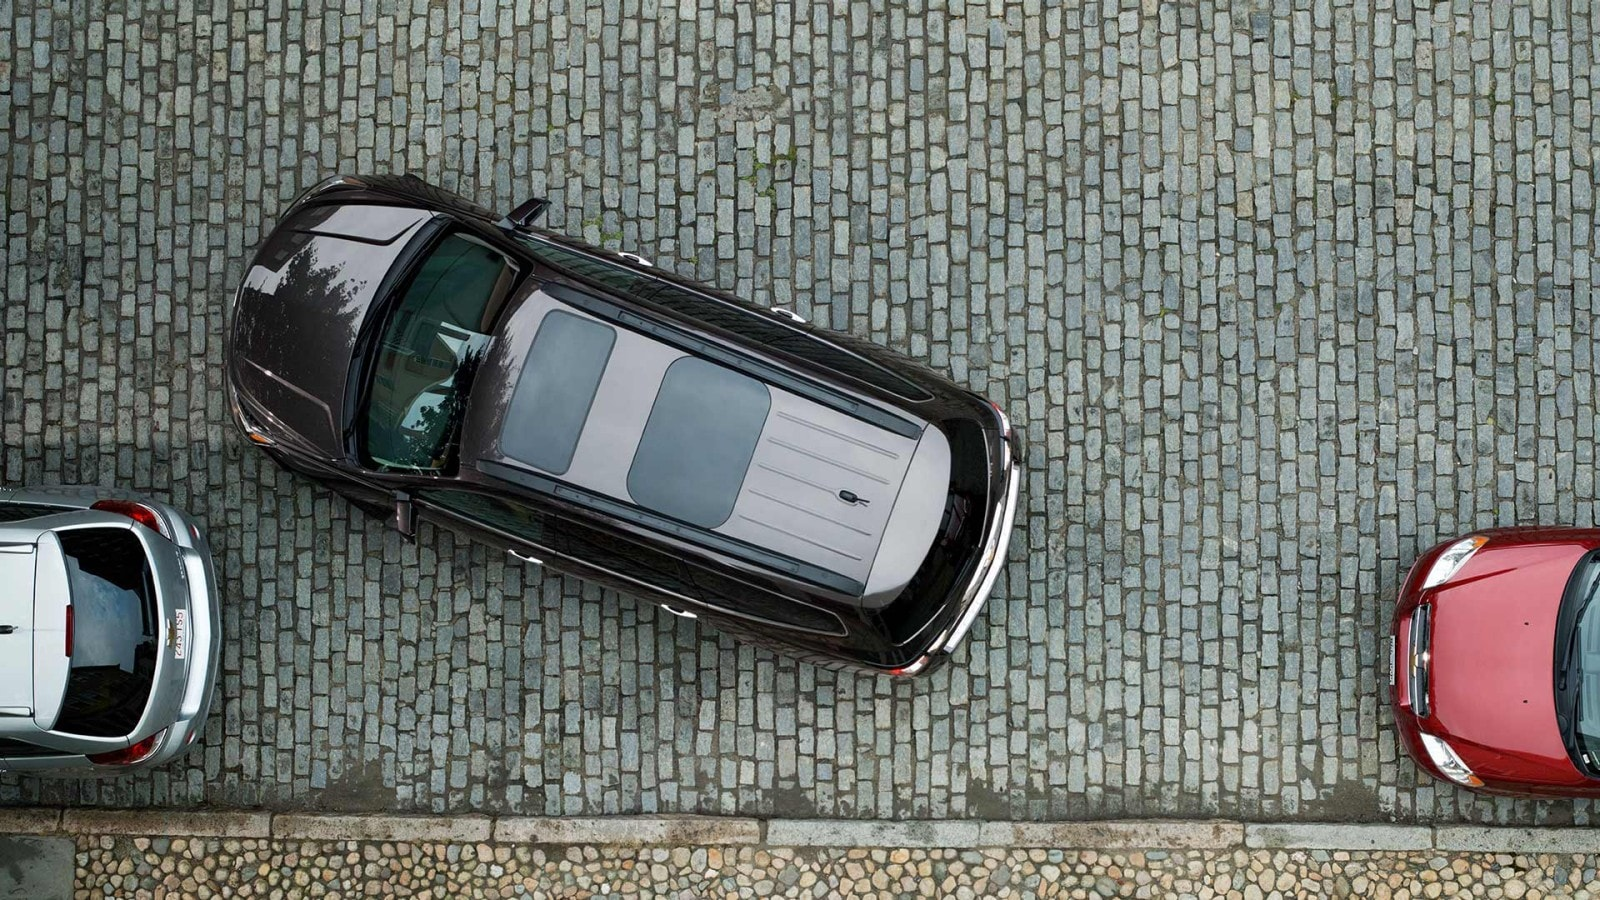 Chevy Zero Interest Car Loan | 0% APR On New Chevy ...